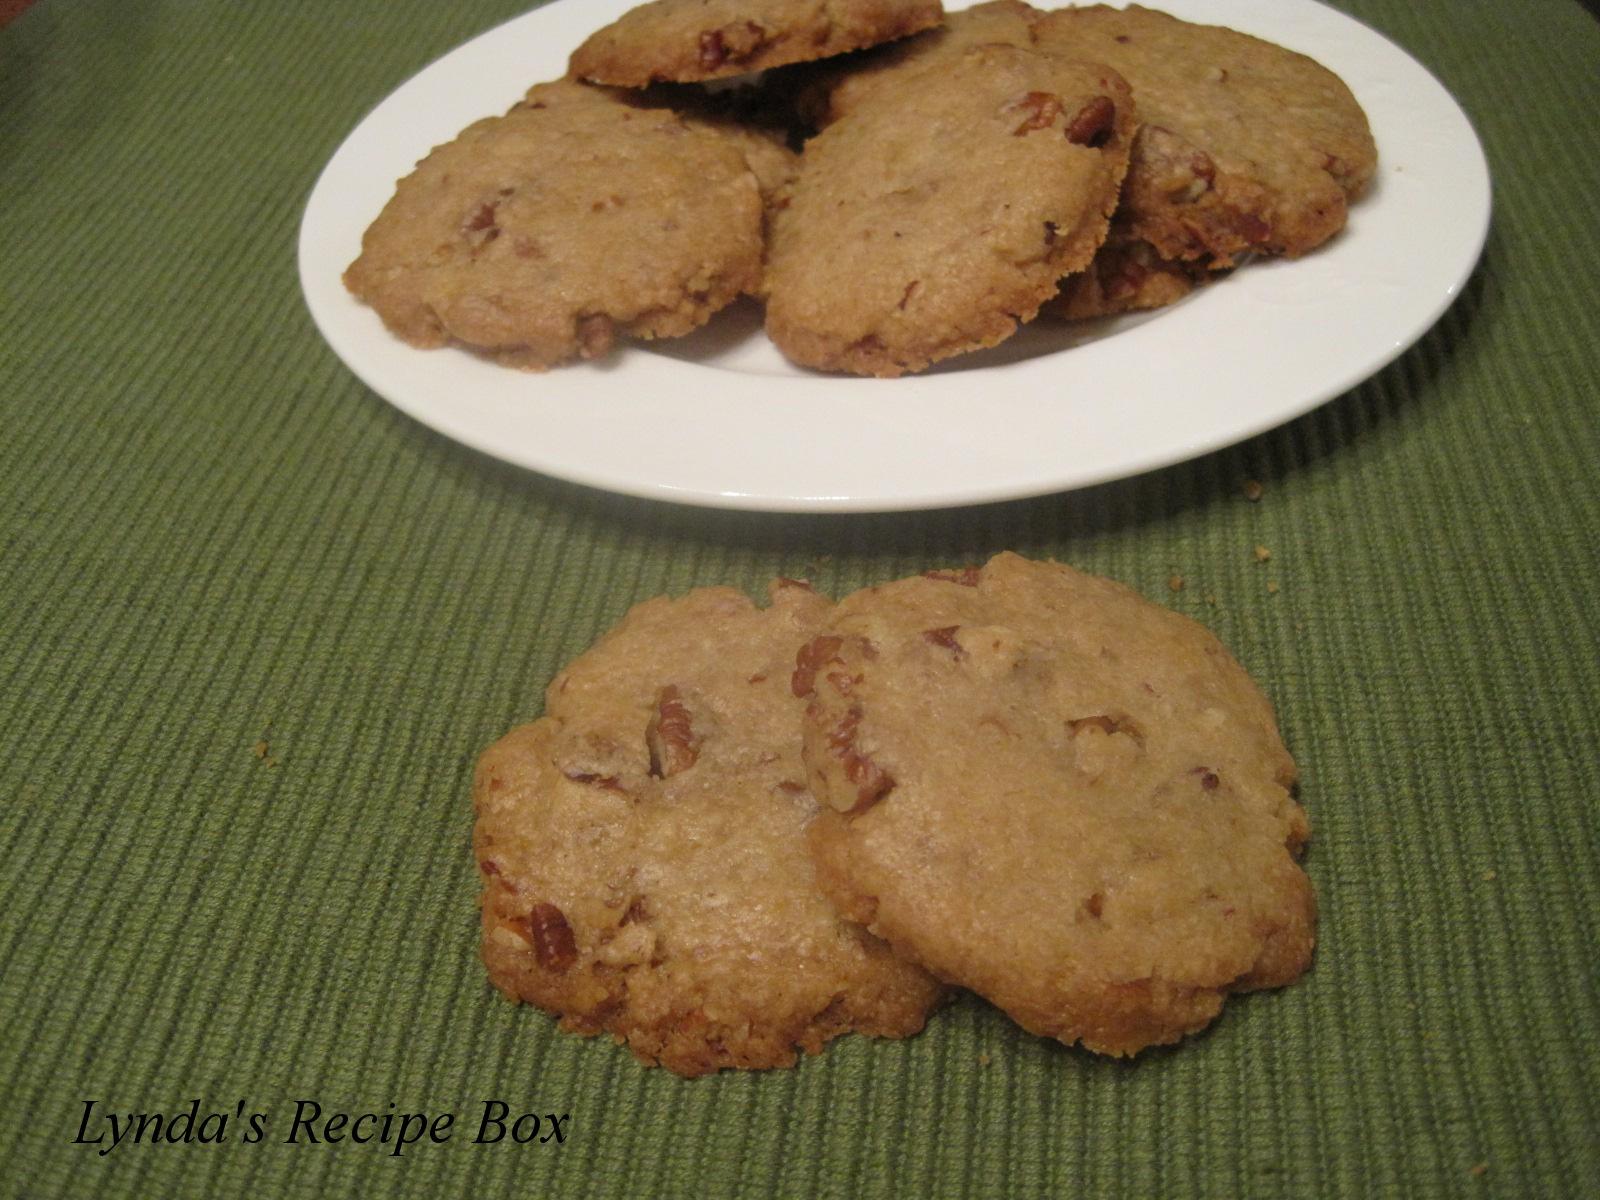 Lynda's Recipe Box: Pecan Sandies